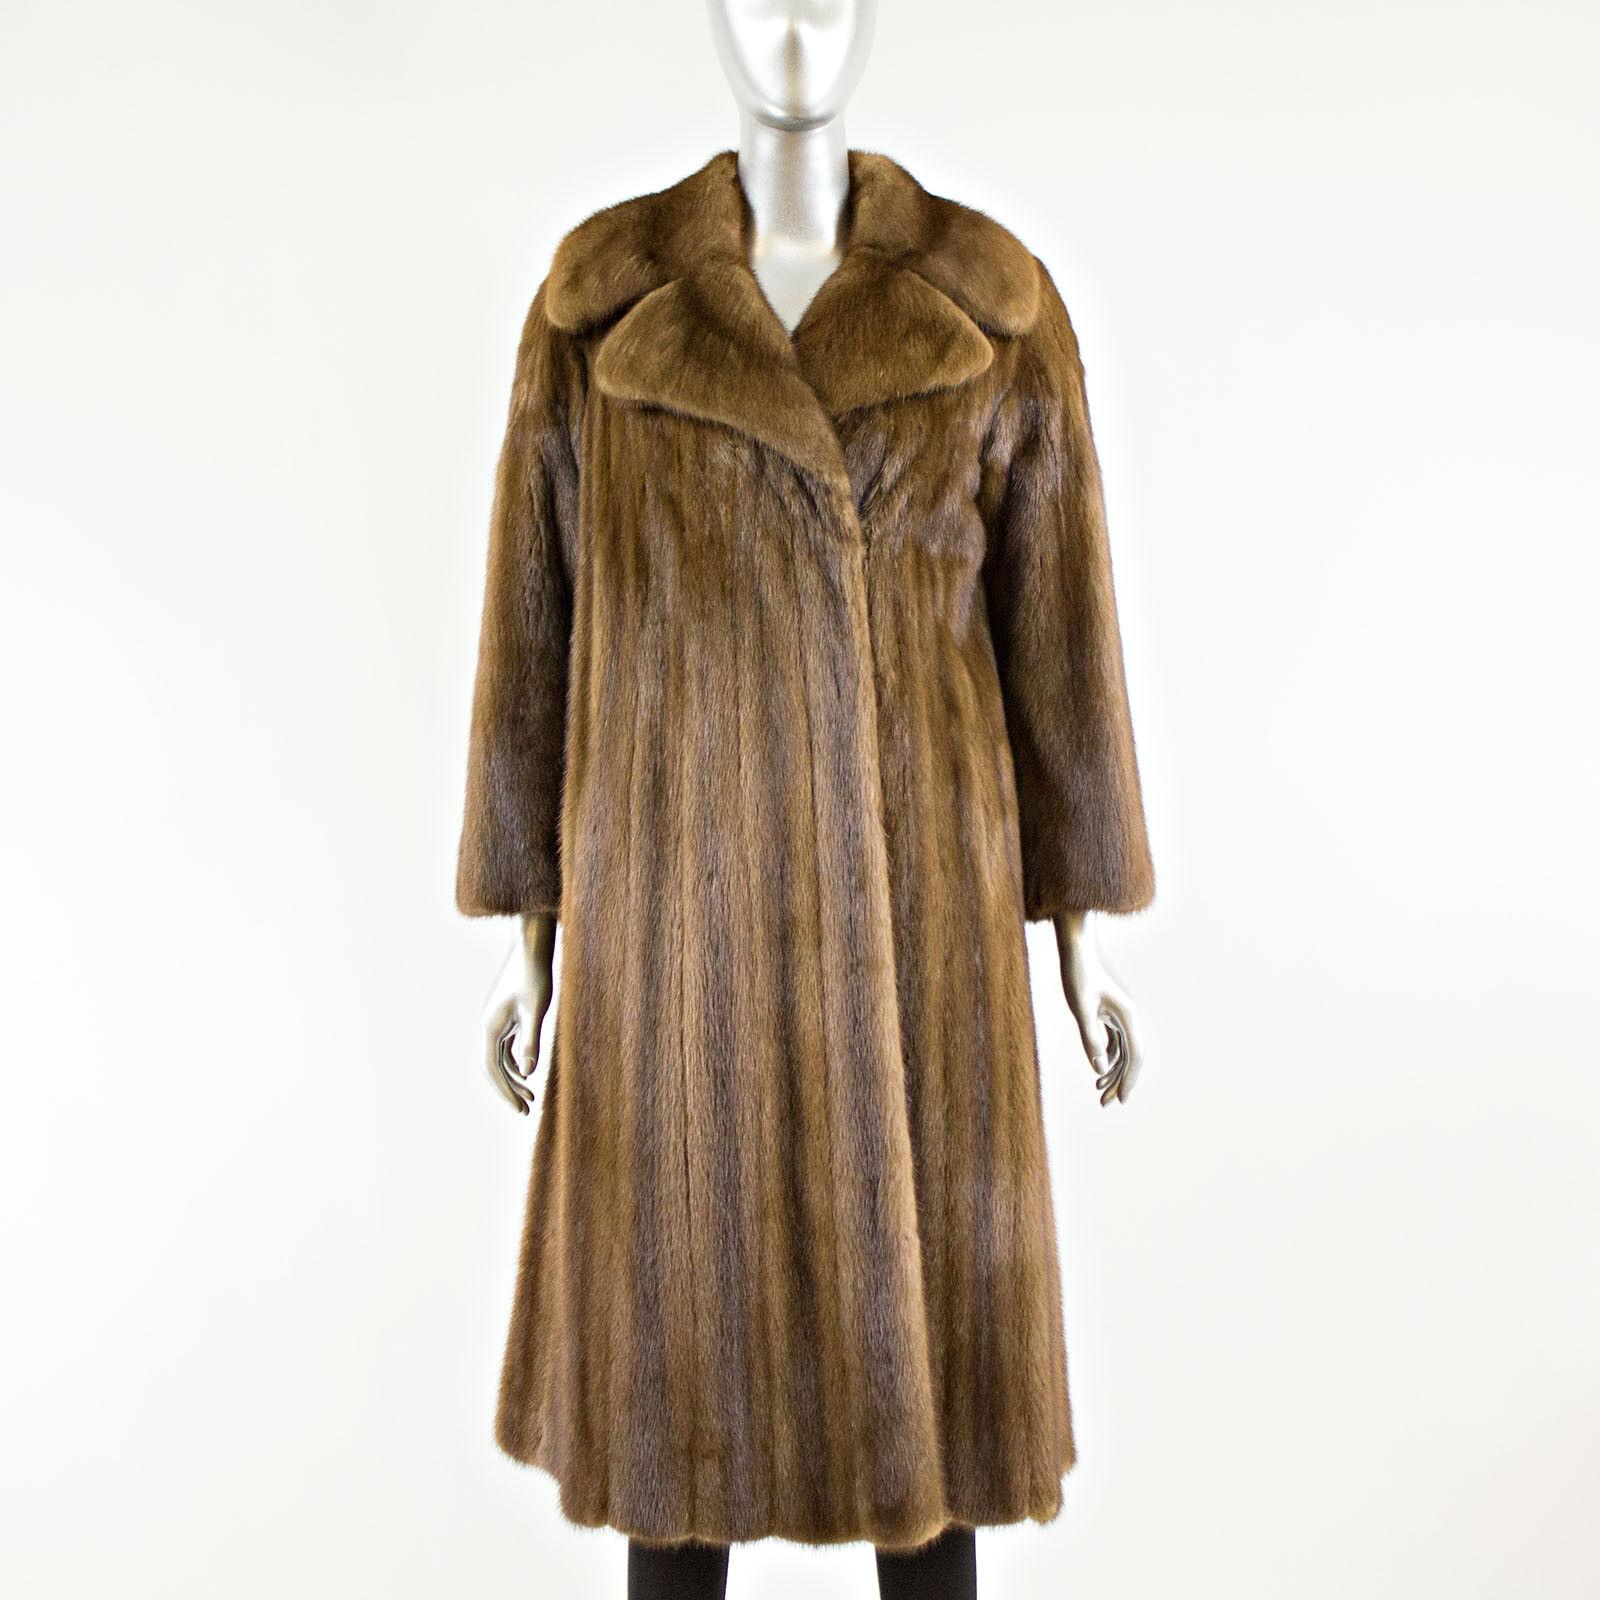 Lunaraine Mink Fur Coat - Size XS